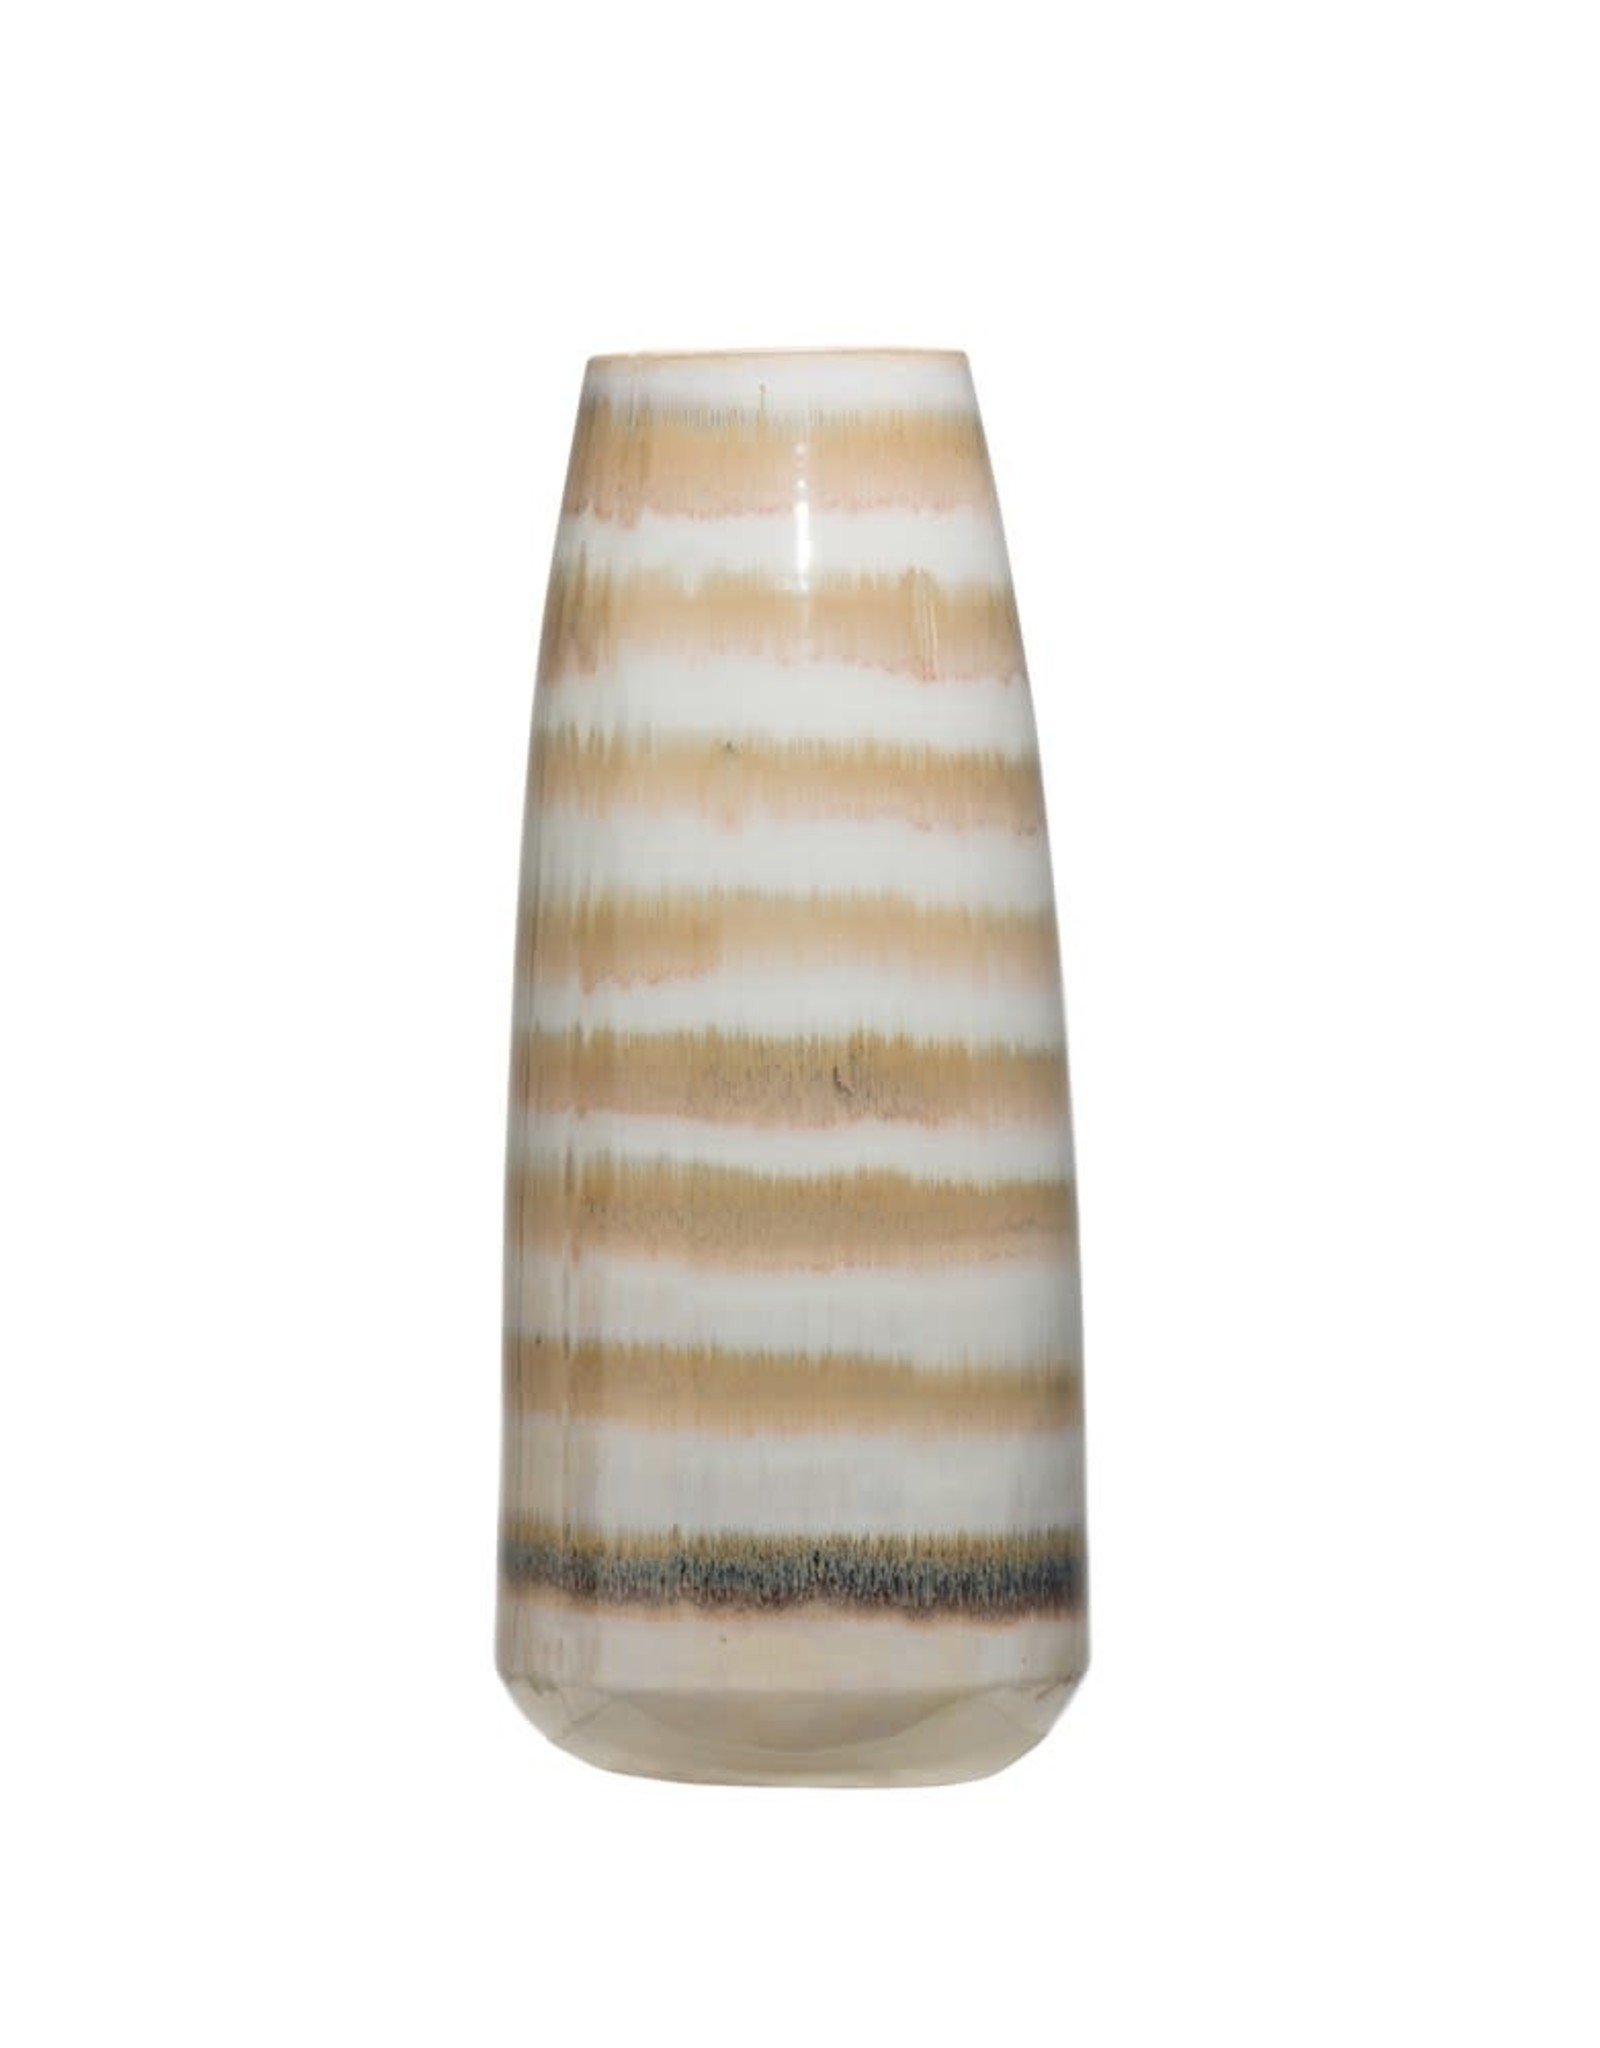 Cream and Brown Stoneware Vase